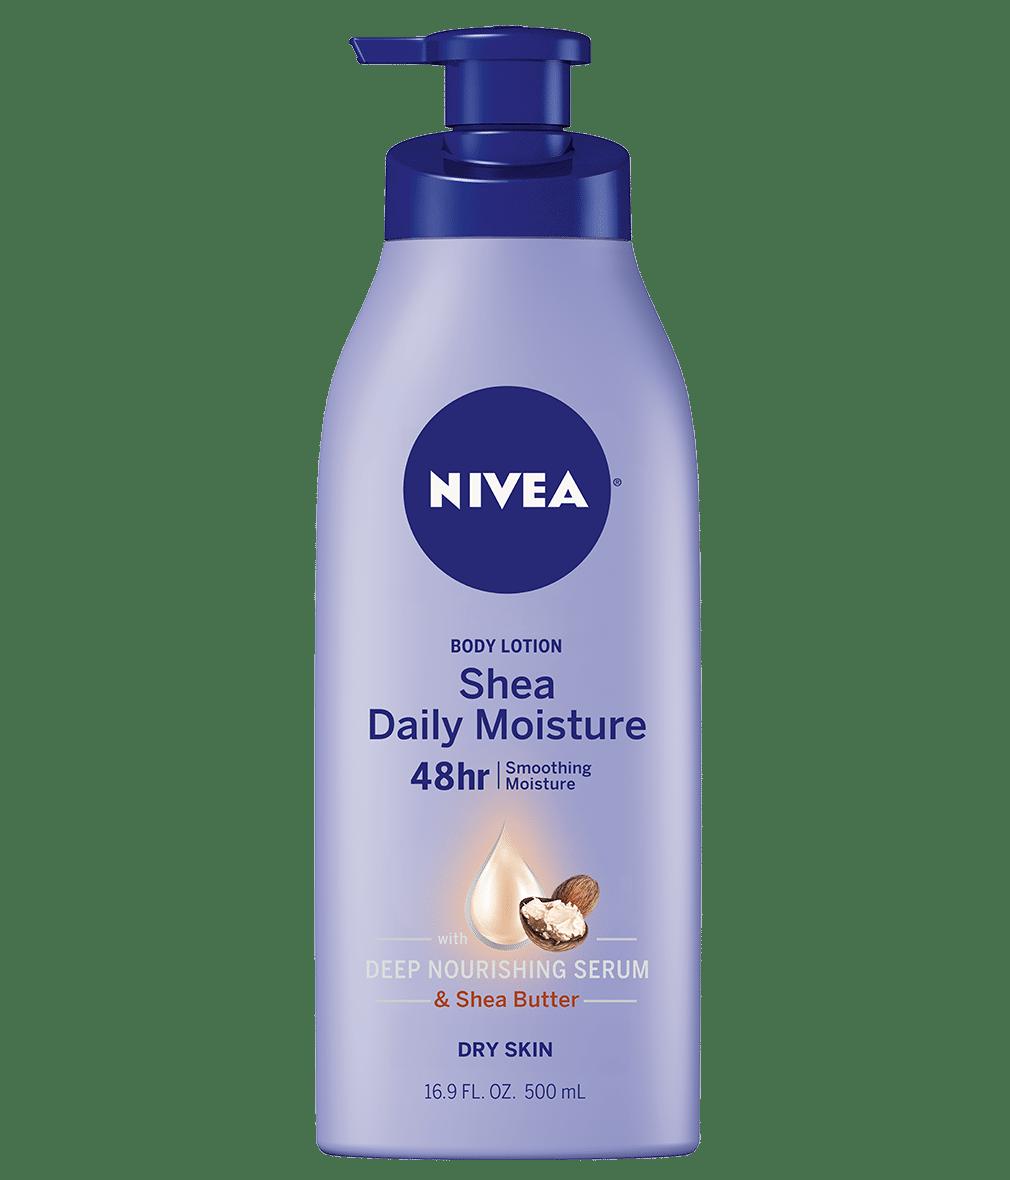 NIVEA - Shea Daily Moisture Body Lotion